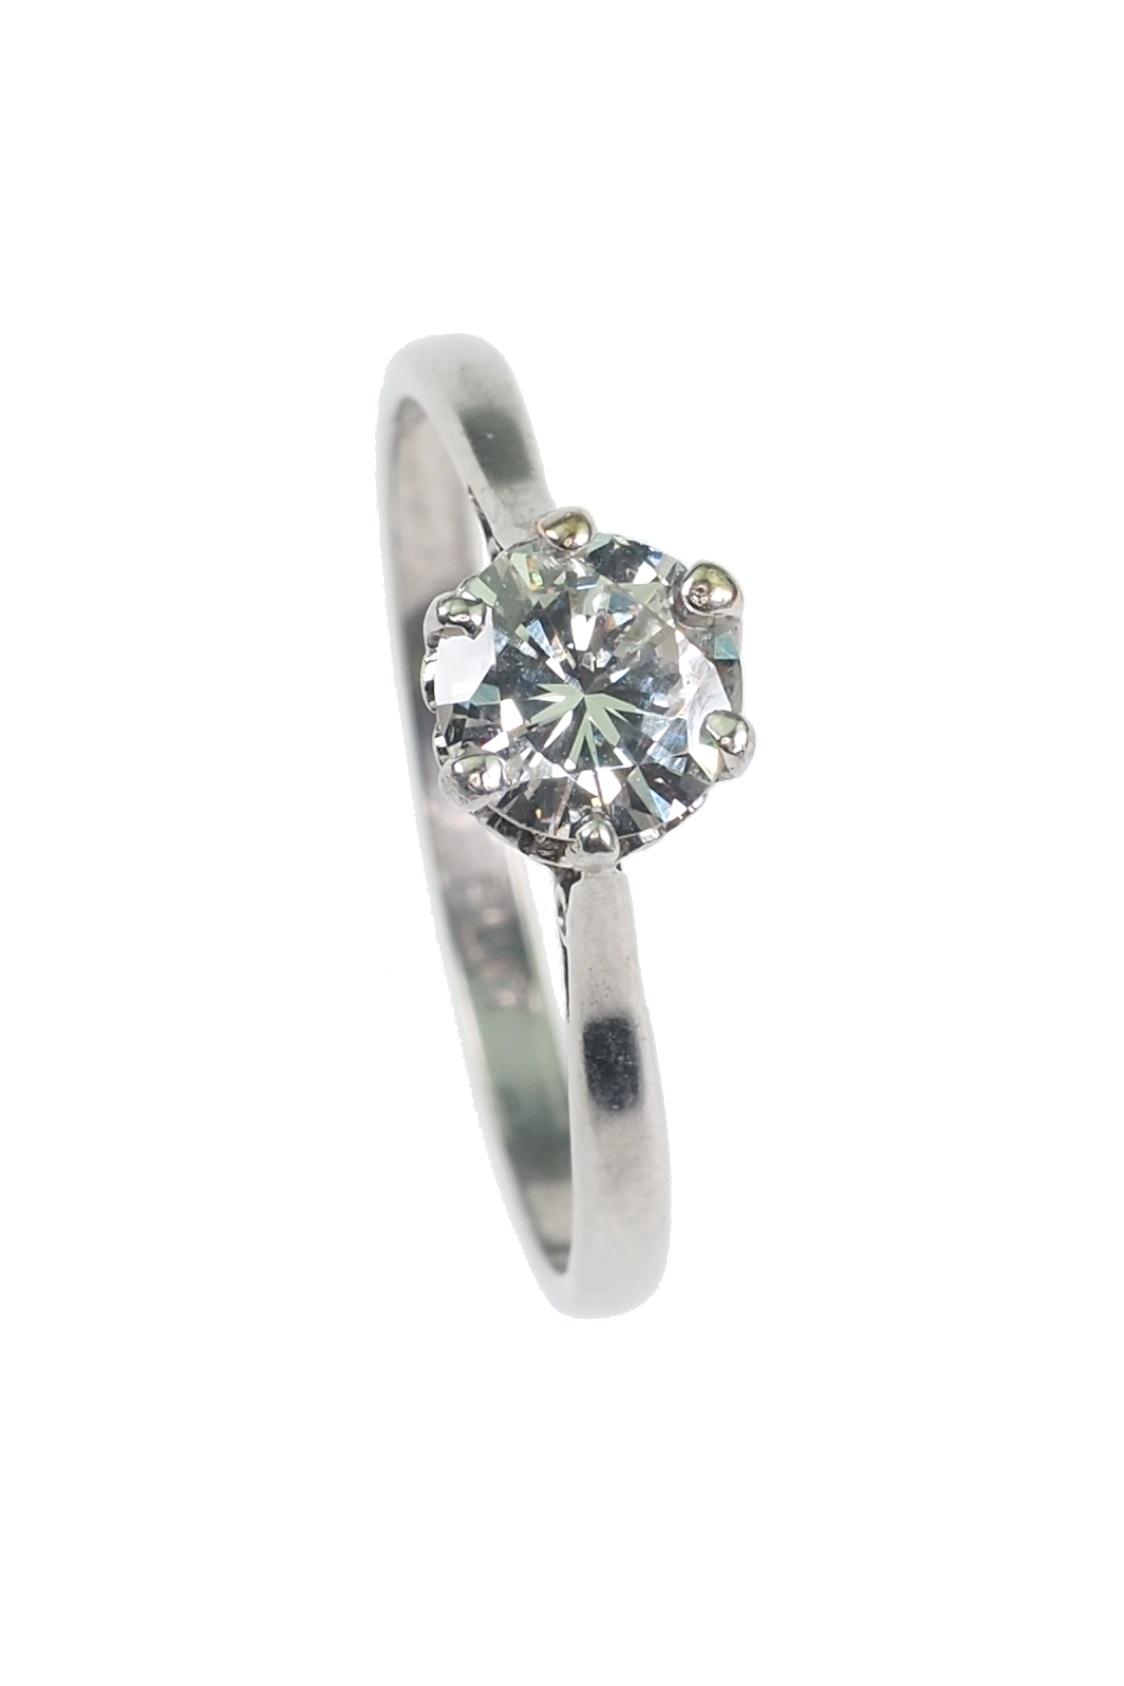 zertifizierten-Diamantschmuck-kaufen-0215a